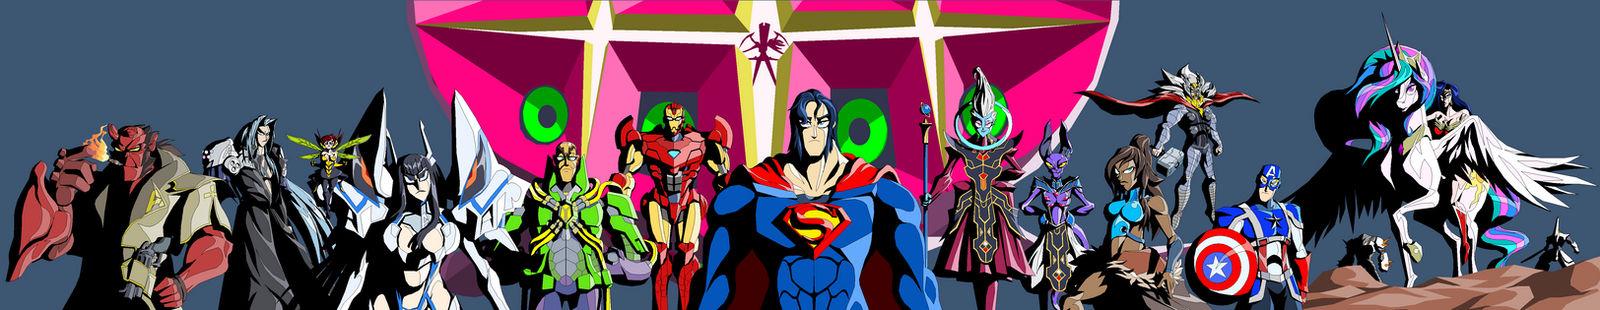 Fan Fiction Fuel - Super Avengers